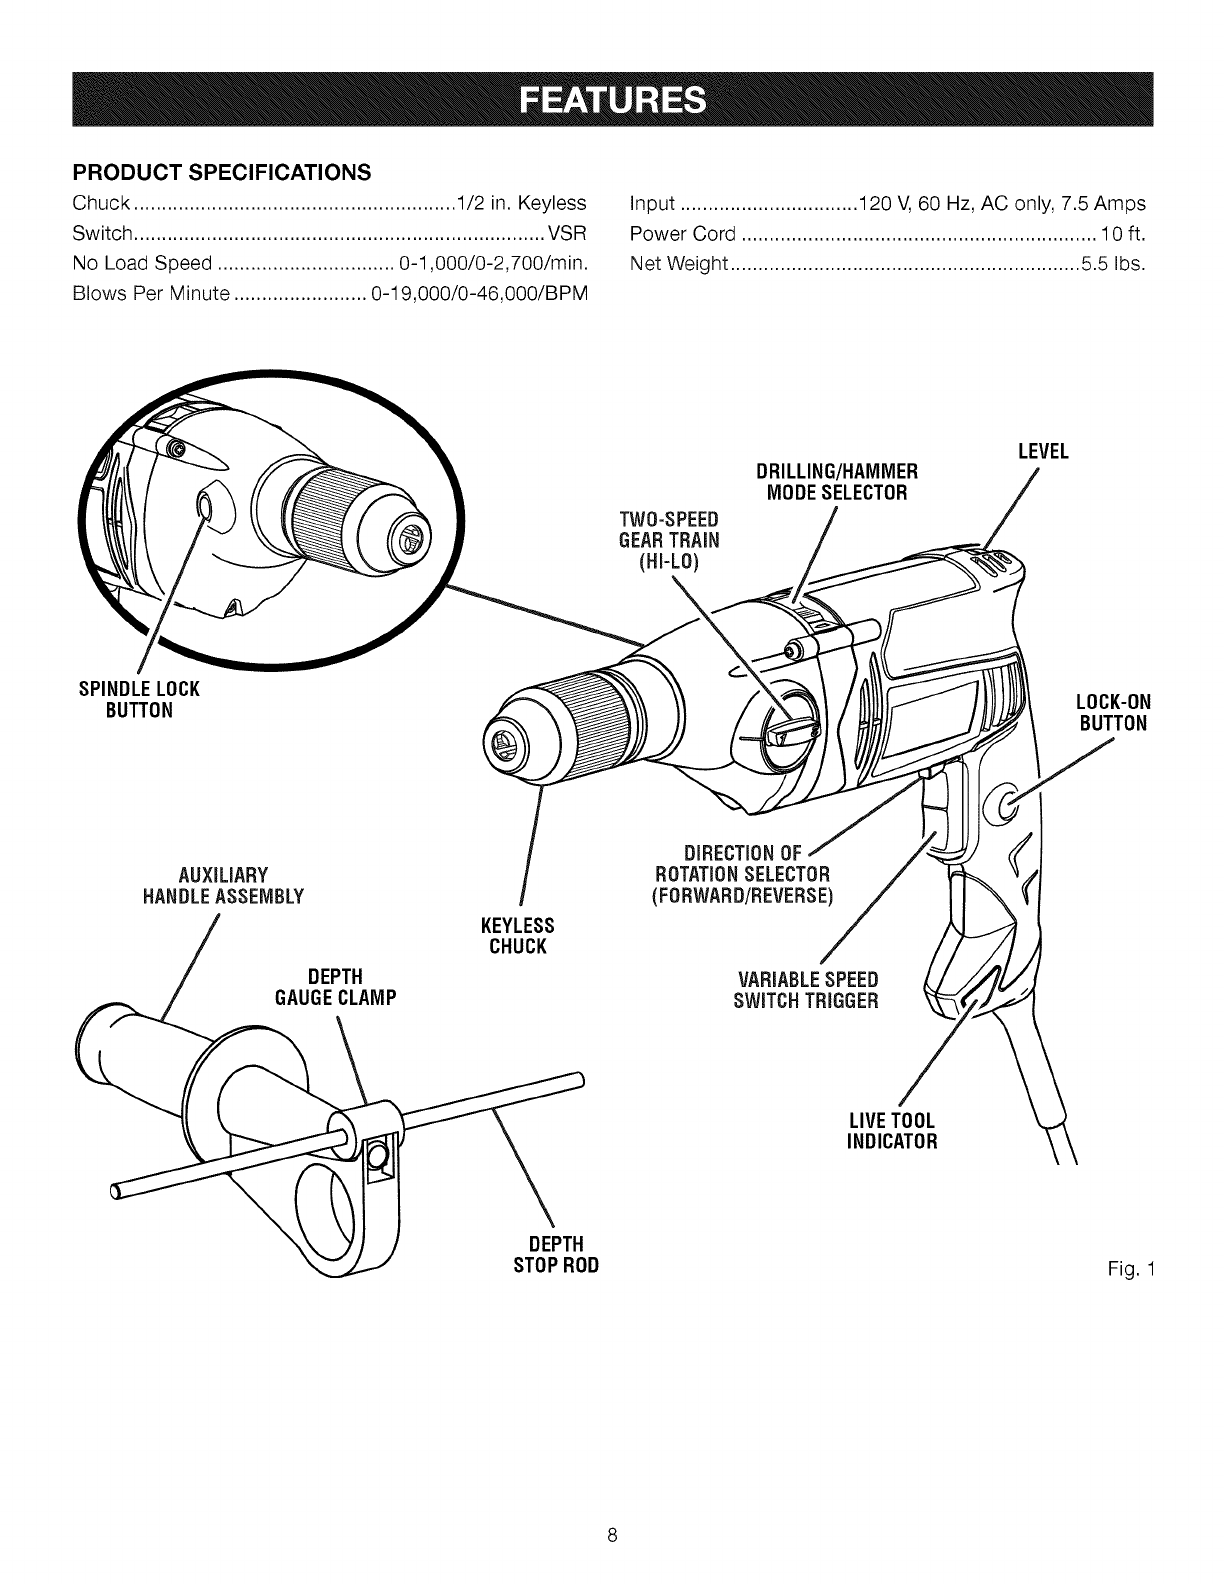 Craftsman User Manual Hammer Drill Manuals And